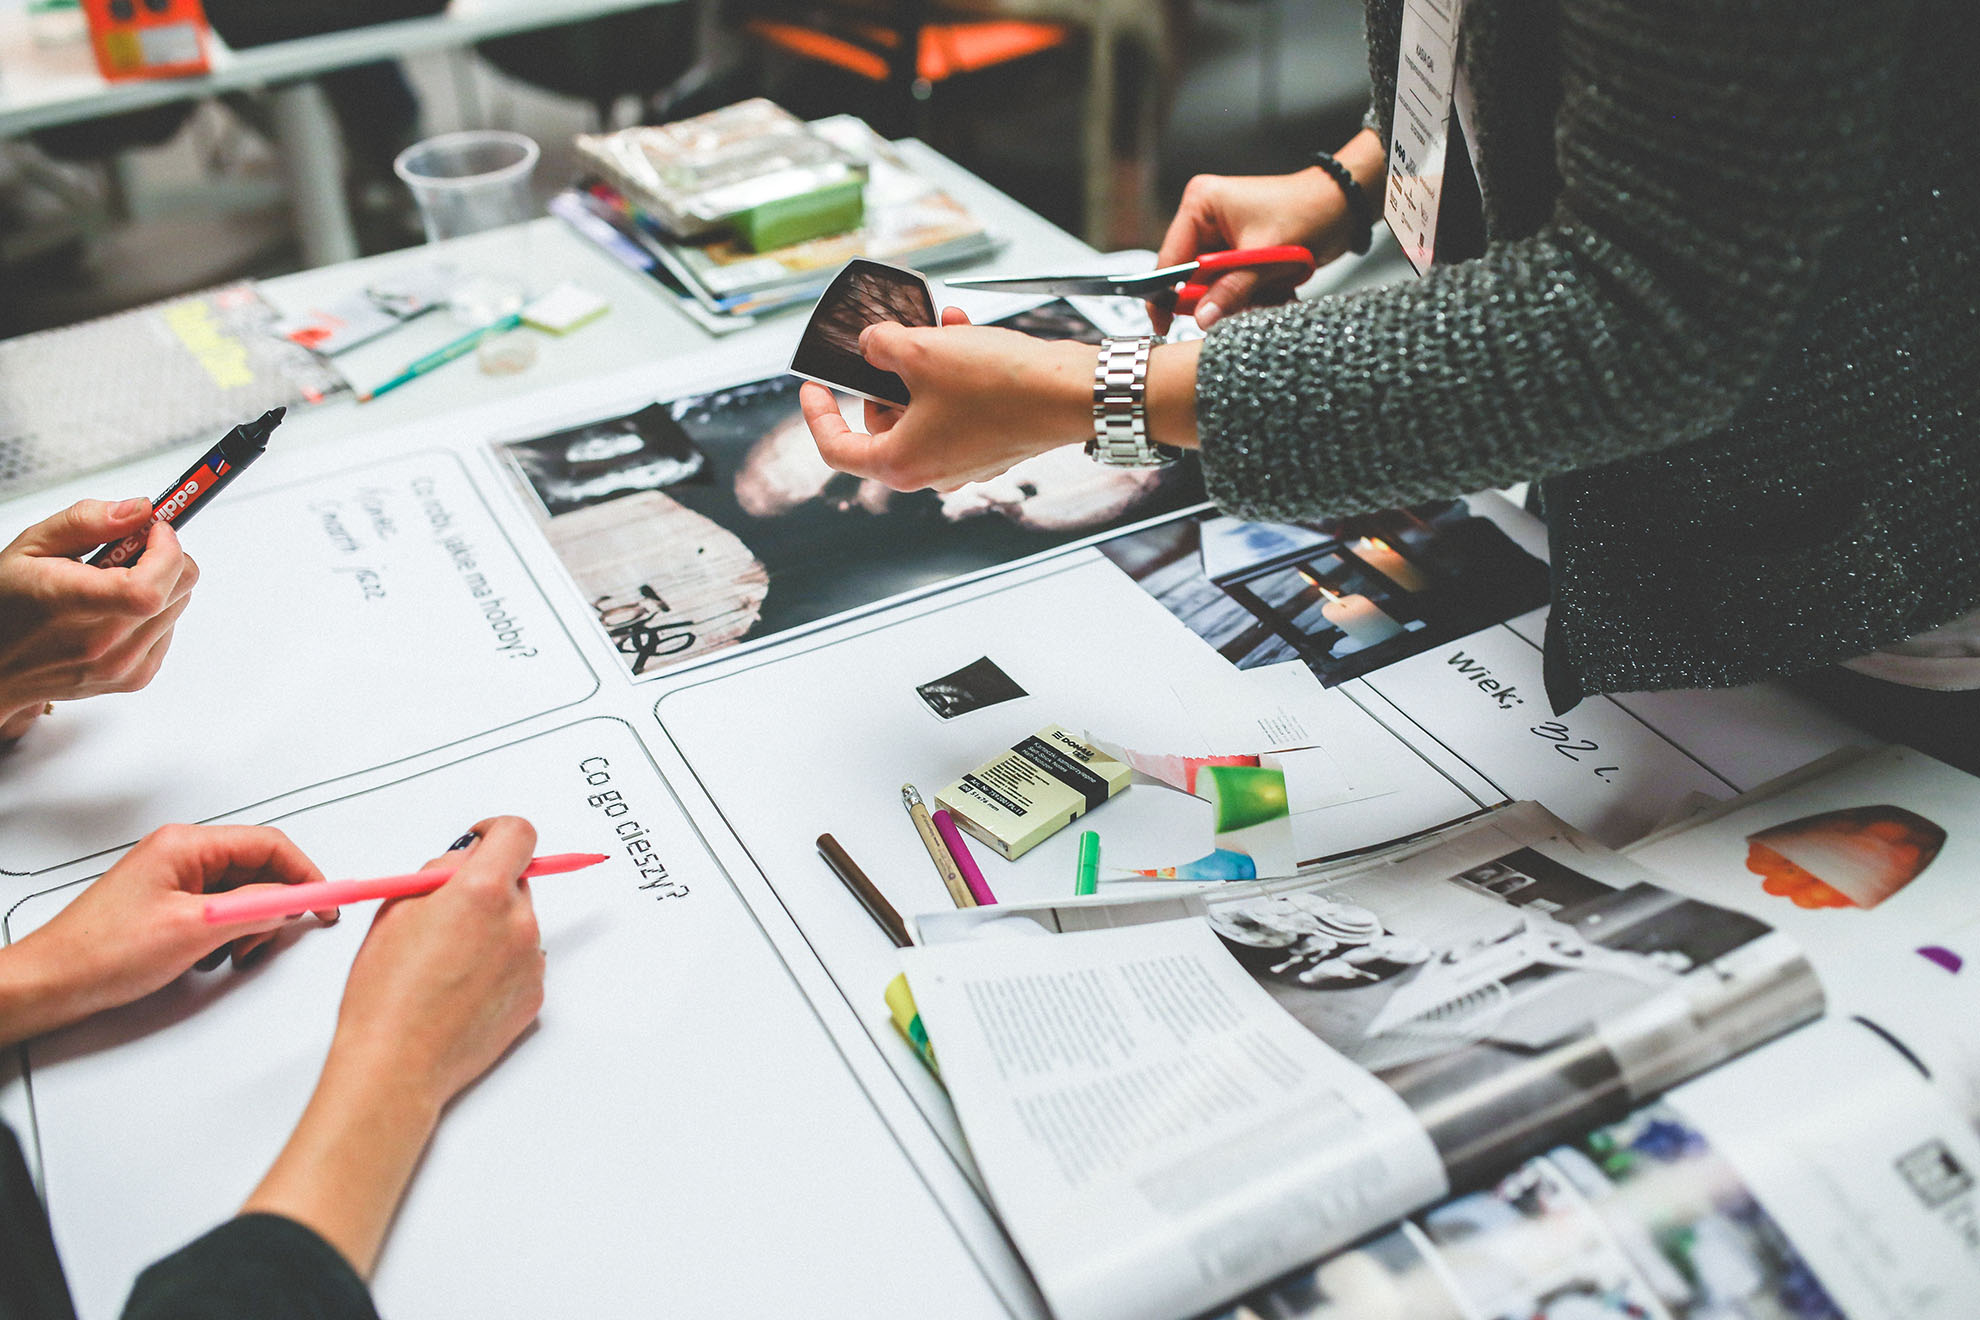 UX design career path